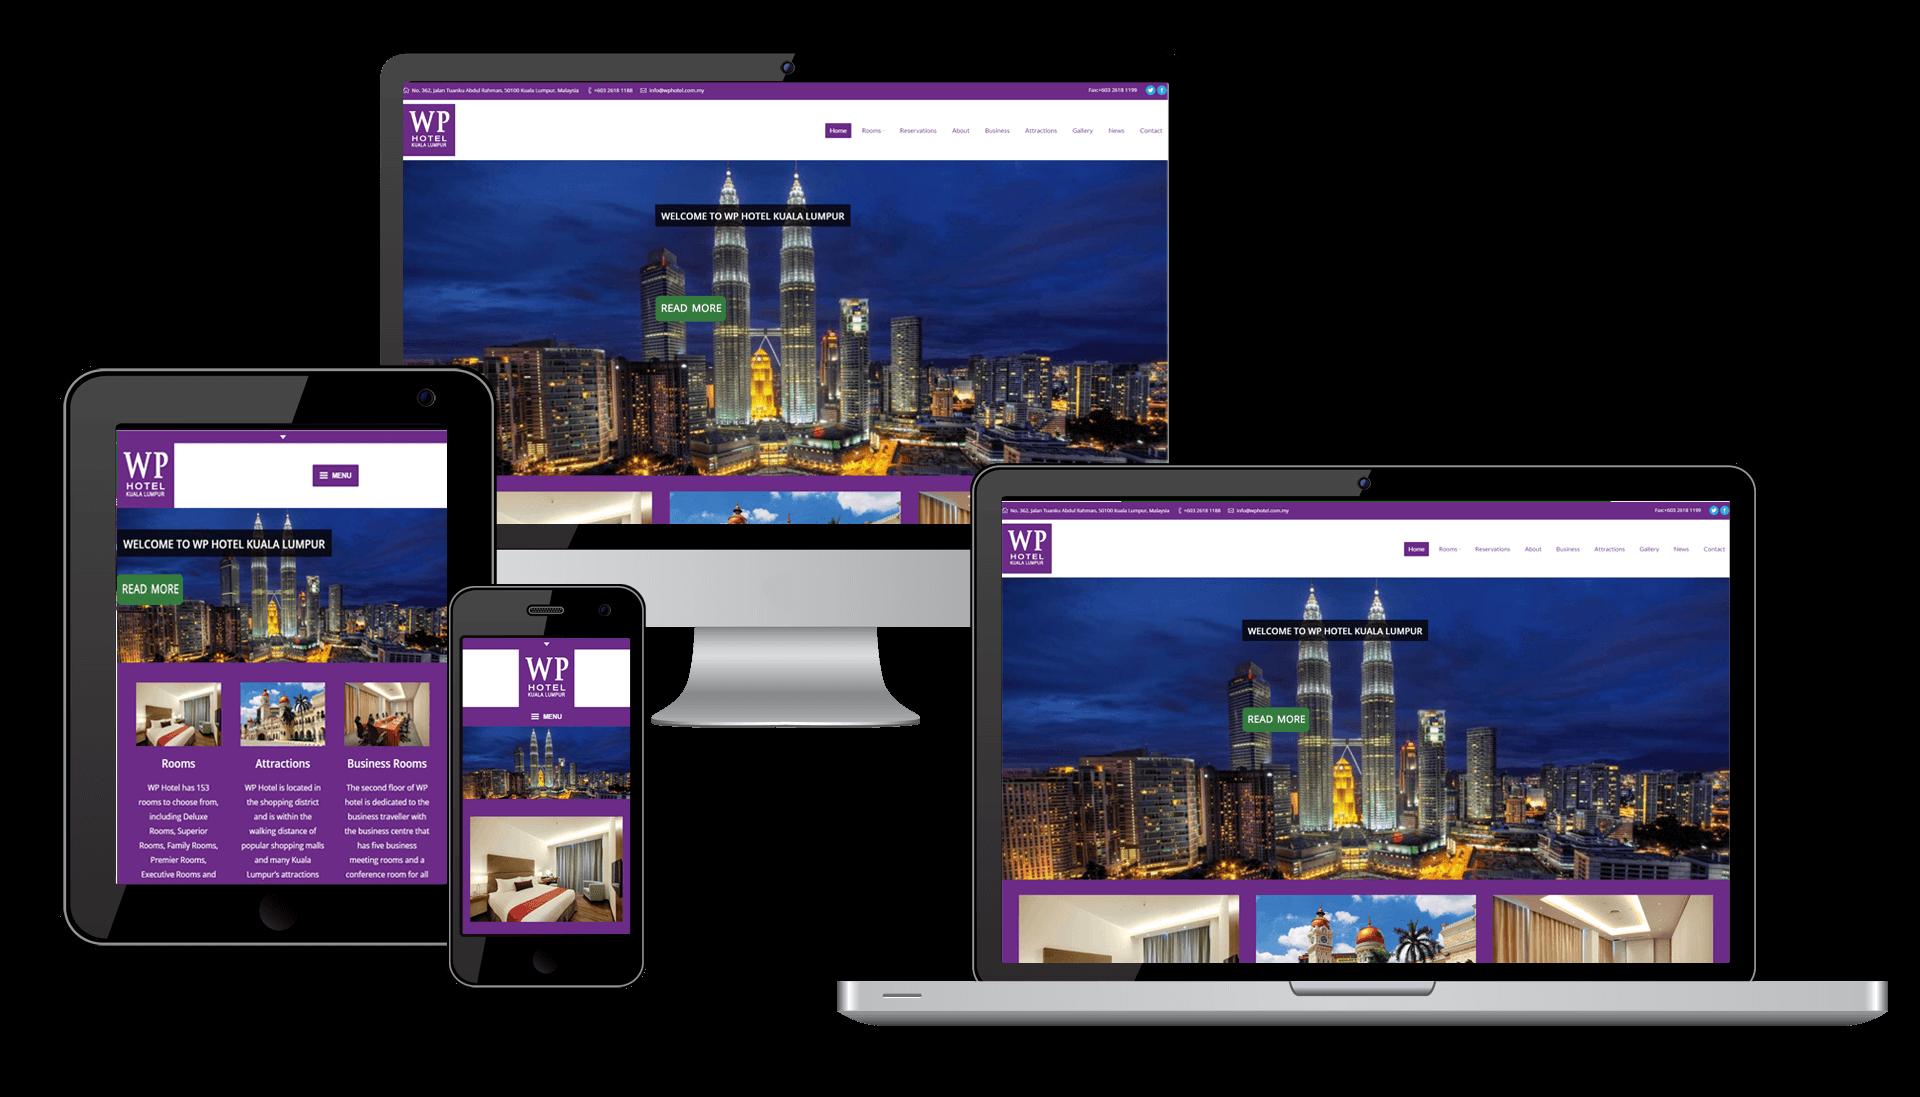 WP Hotel website